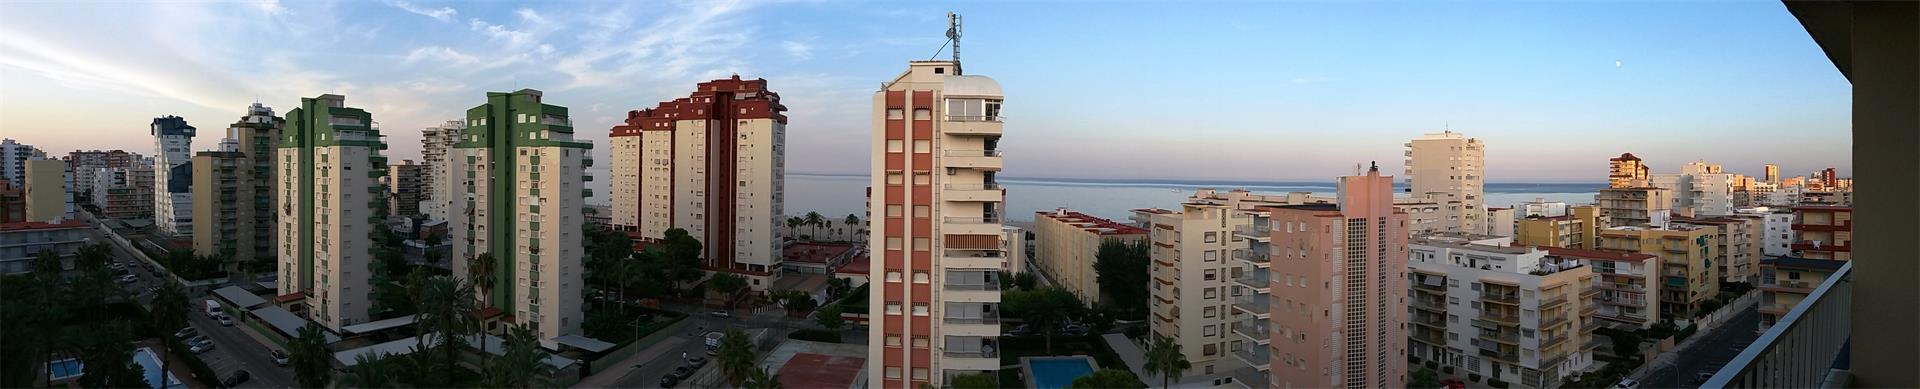 Alquiler Apartamento  Calle menorca. Playa de gandia / calle menorca